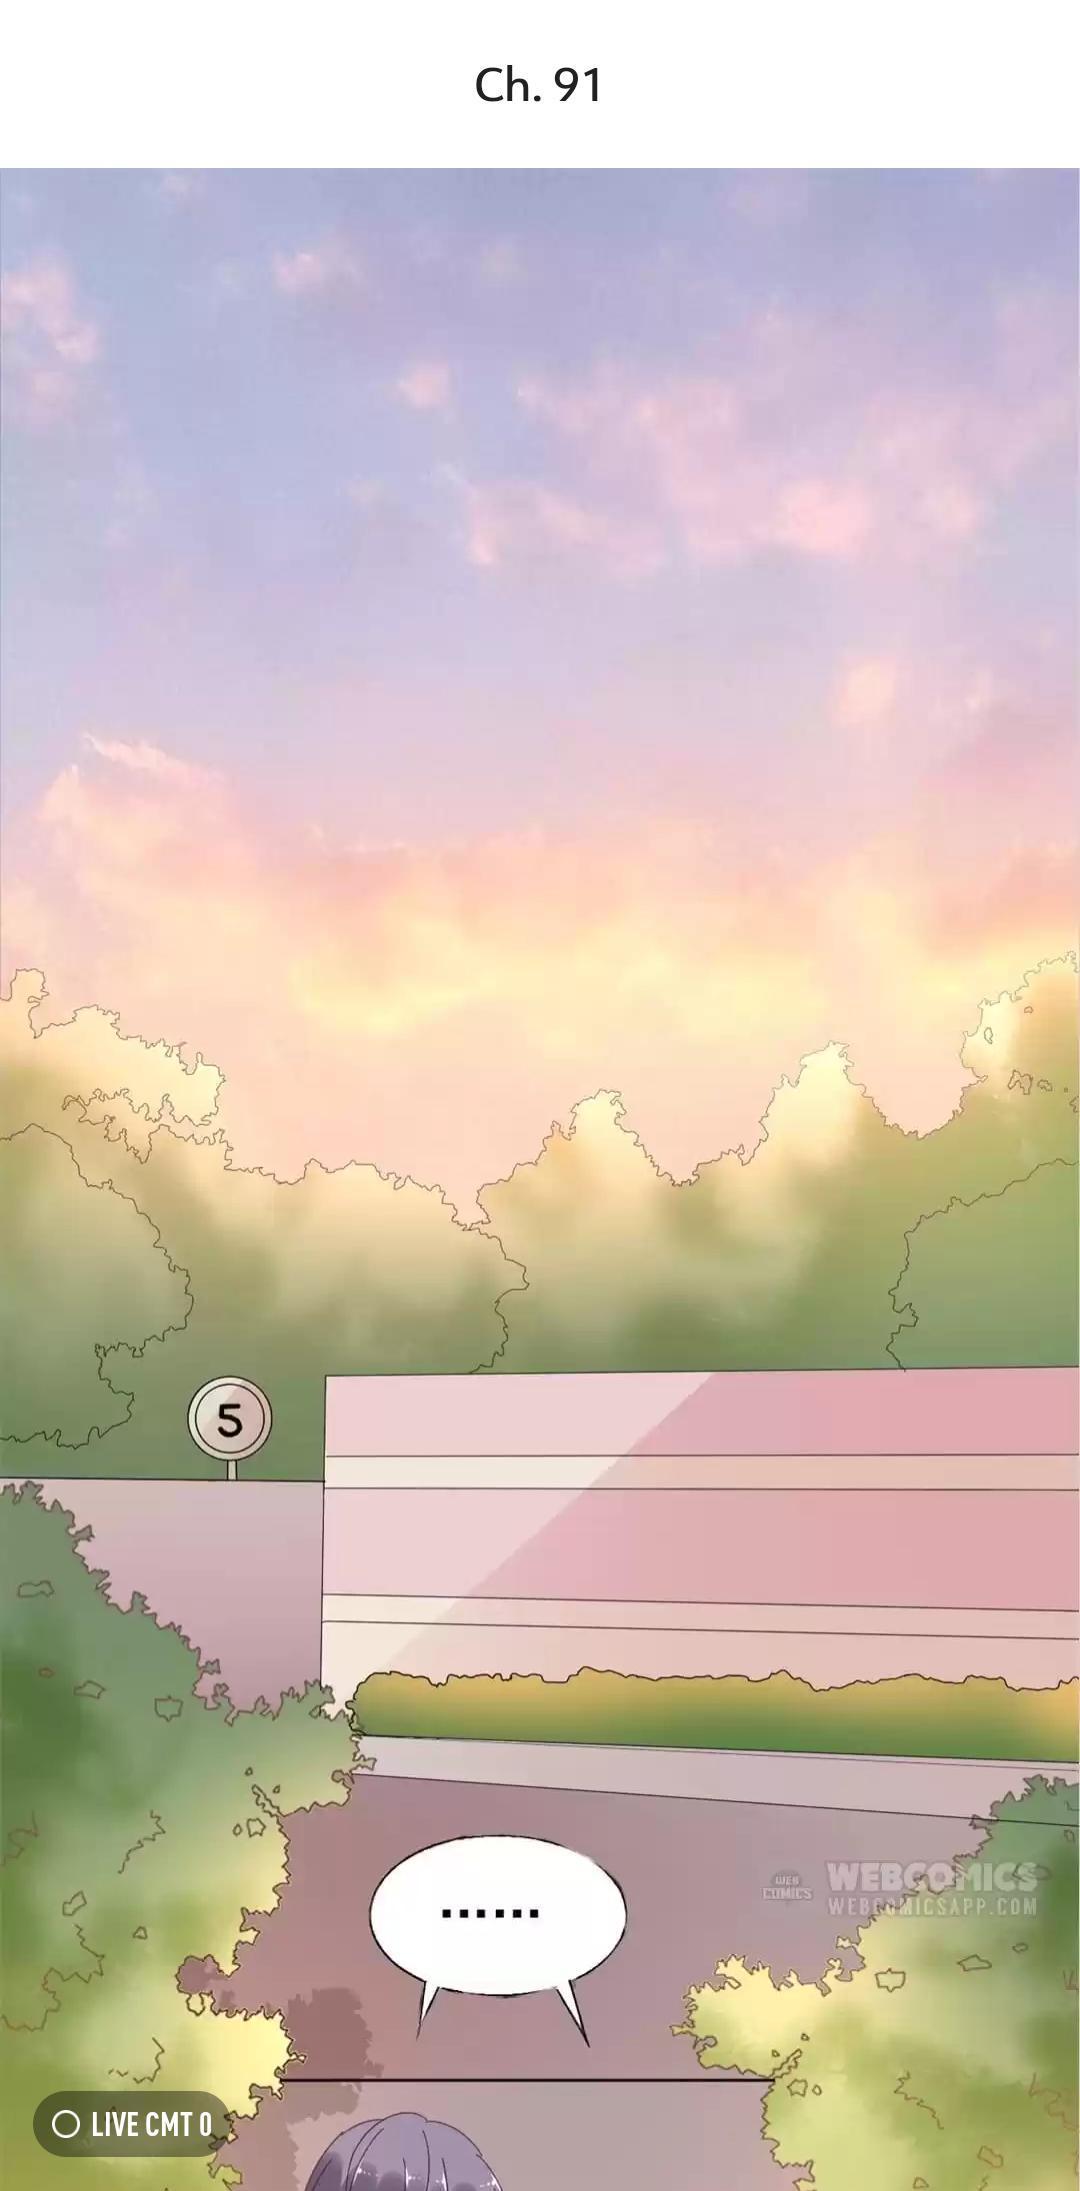 Be My Only Love Chapter 91 page 1 - Mangakakalots.com